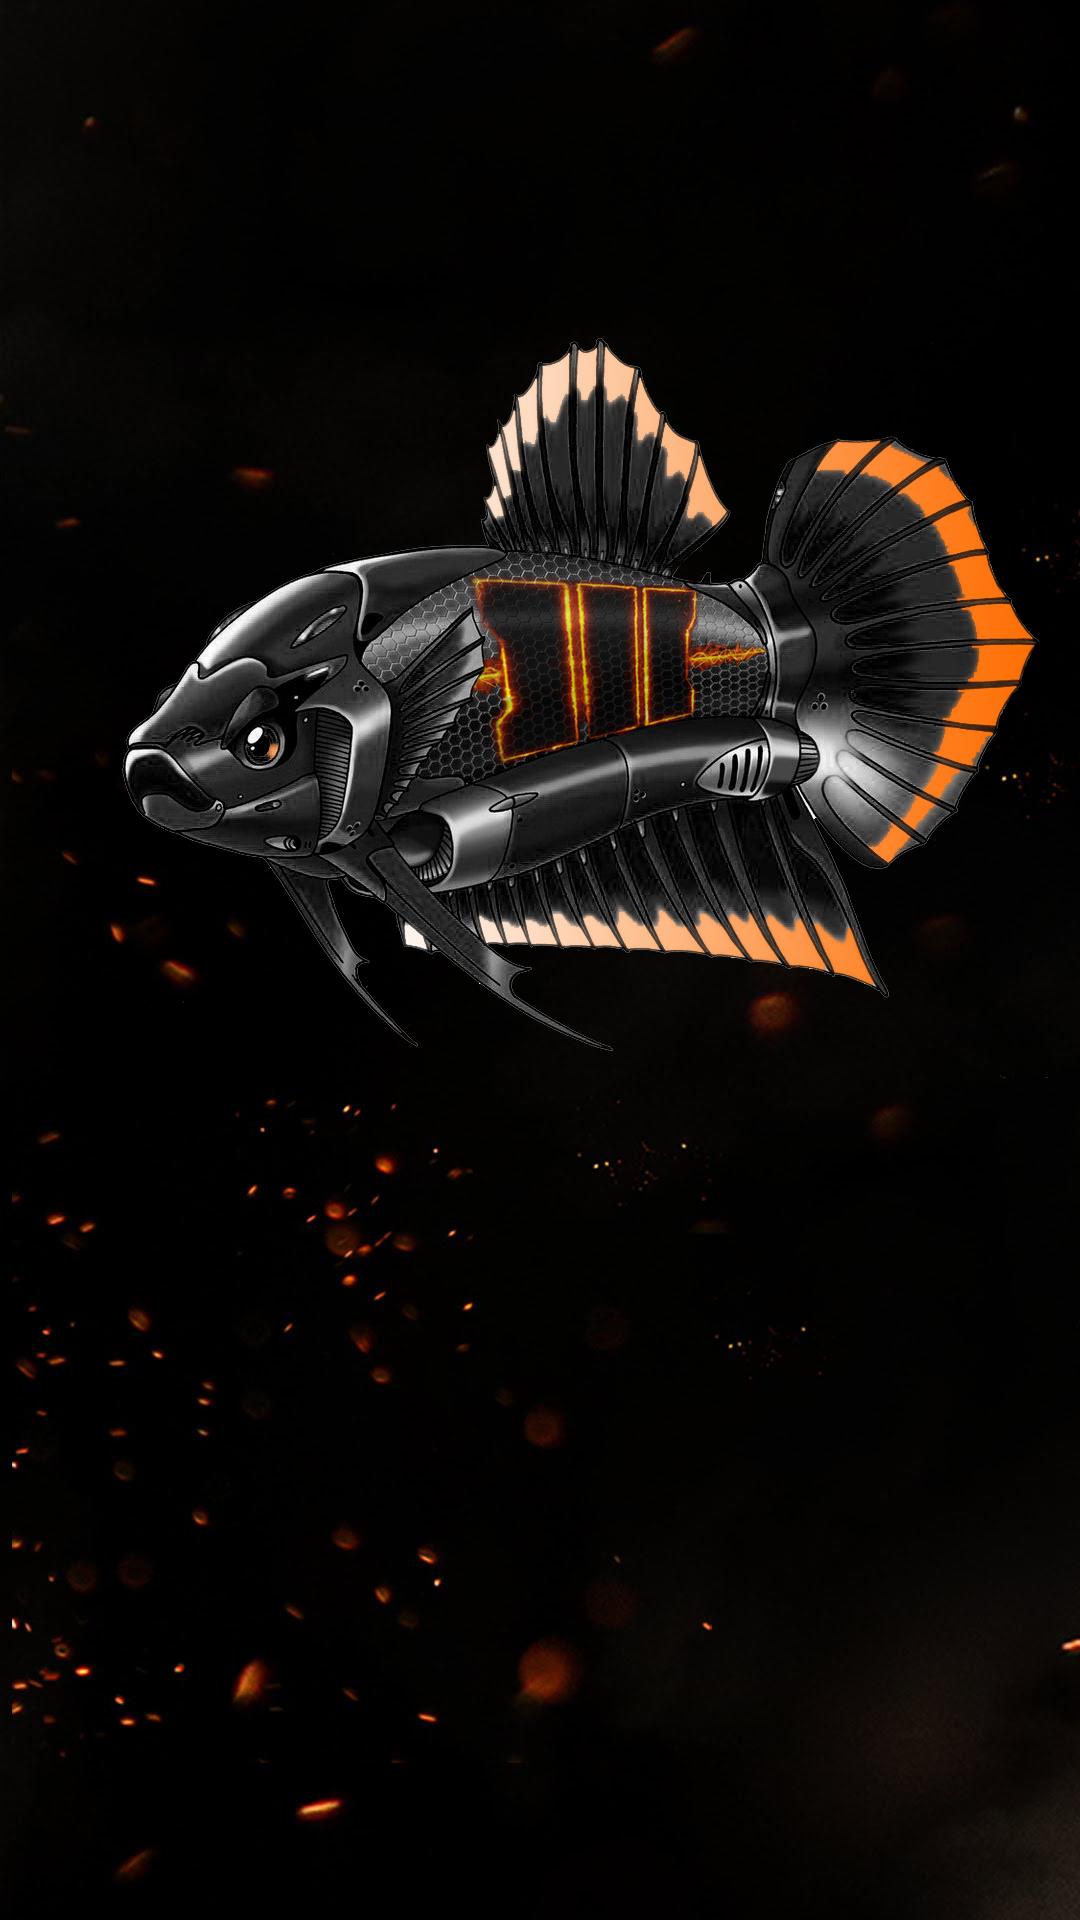 Black Ops 3 Betta Wallpaper fish   Imgur 1080x1920